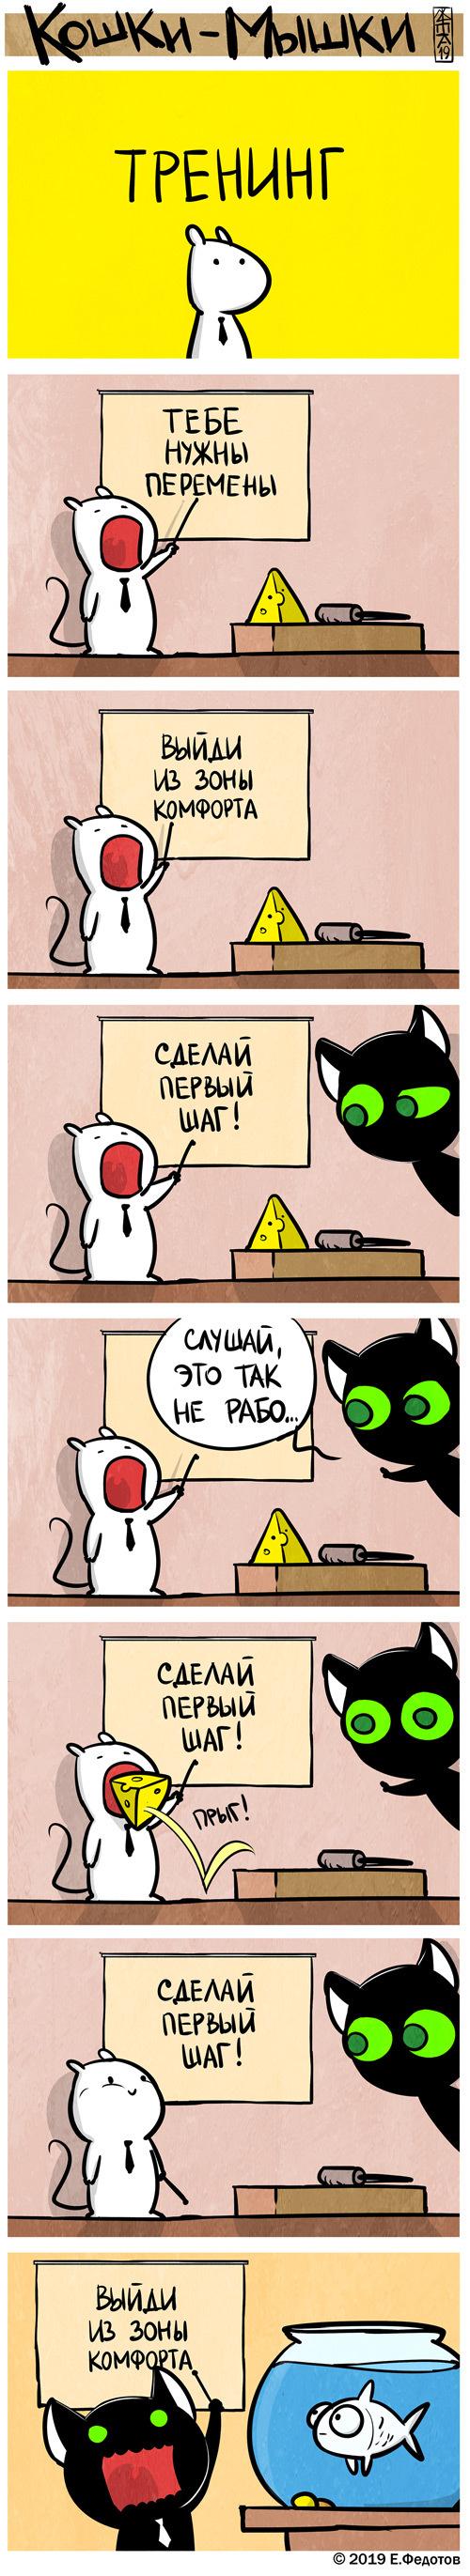 Тренинг Кошки-Мышки, Комиксы, Кот, Тренинг, Длиннопост